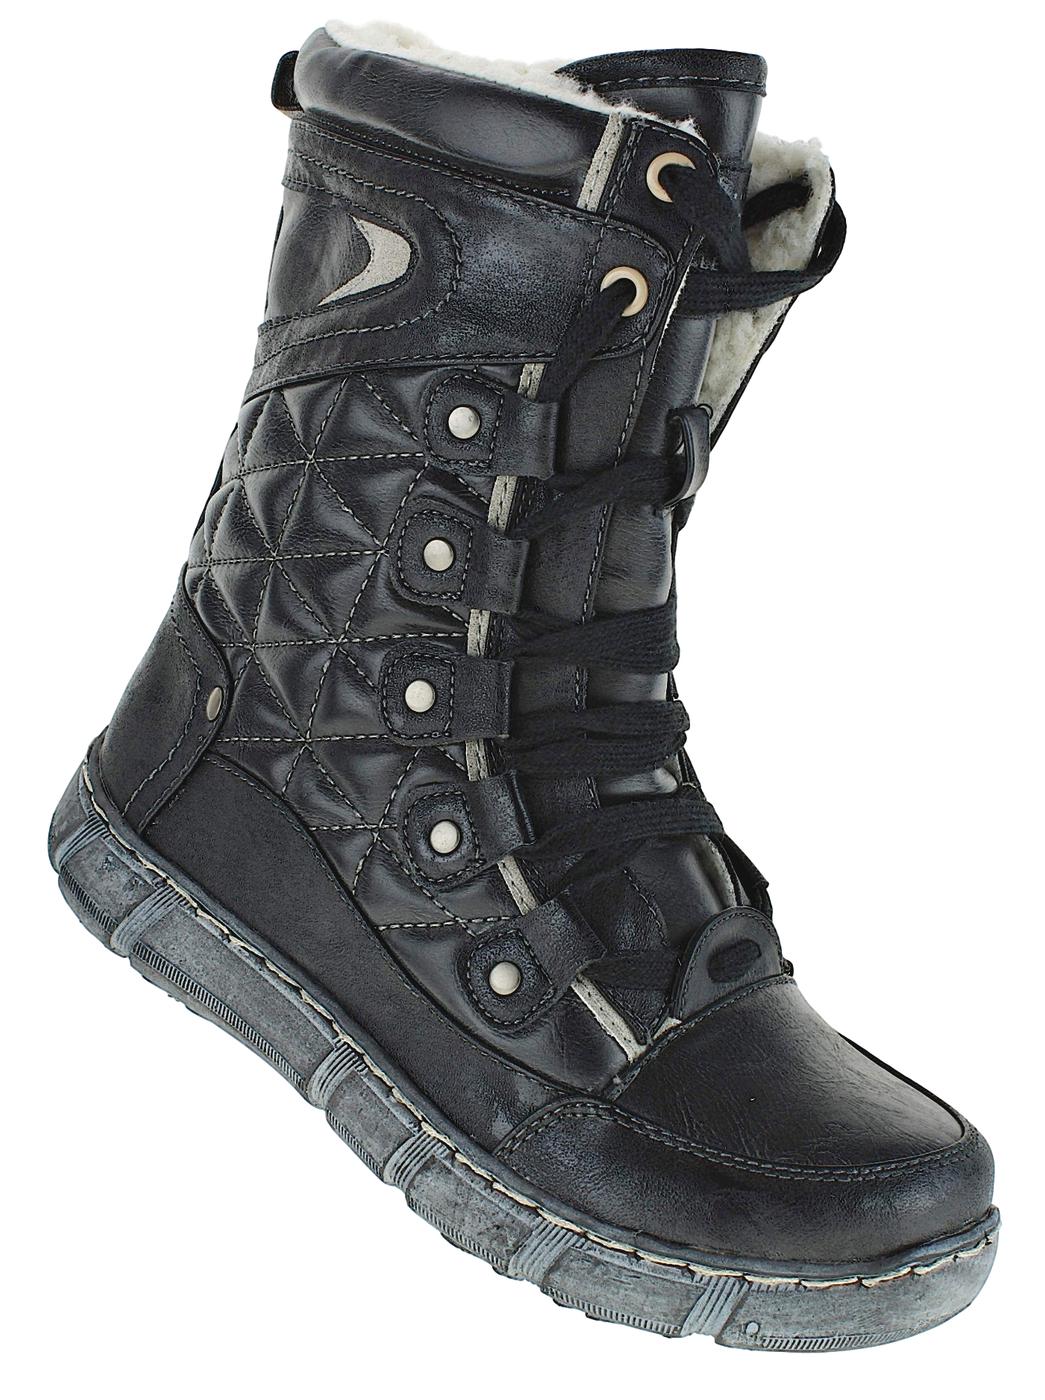 Schuhe Winterschuhe Art 635 Stiefel Boots Damen Damenstiefel Neu Winterstiefel ULpjqMGzSV